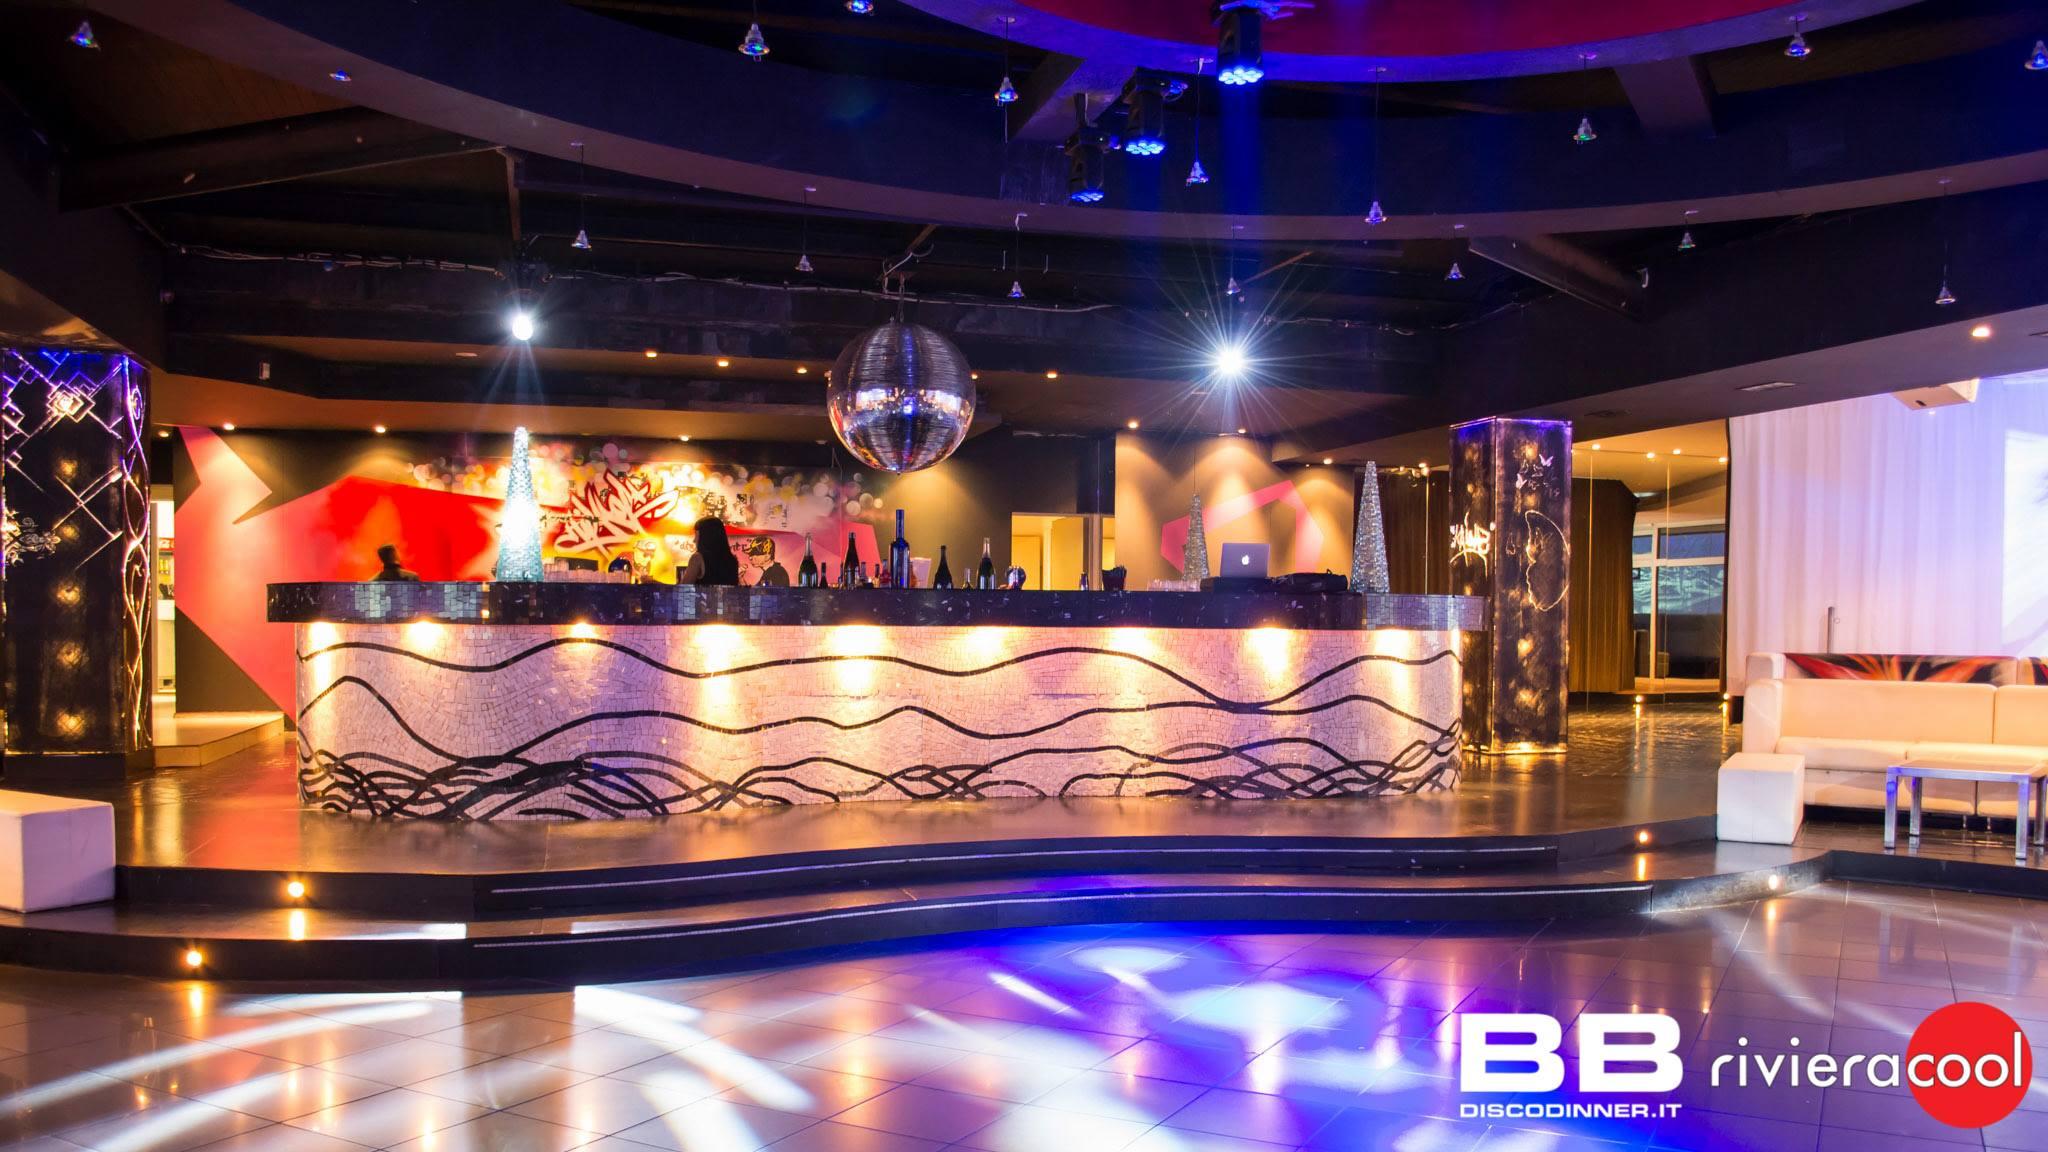 Discoteca BB, party di Natale 2015